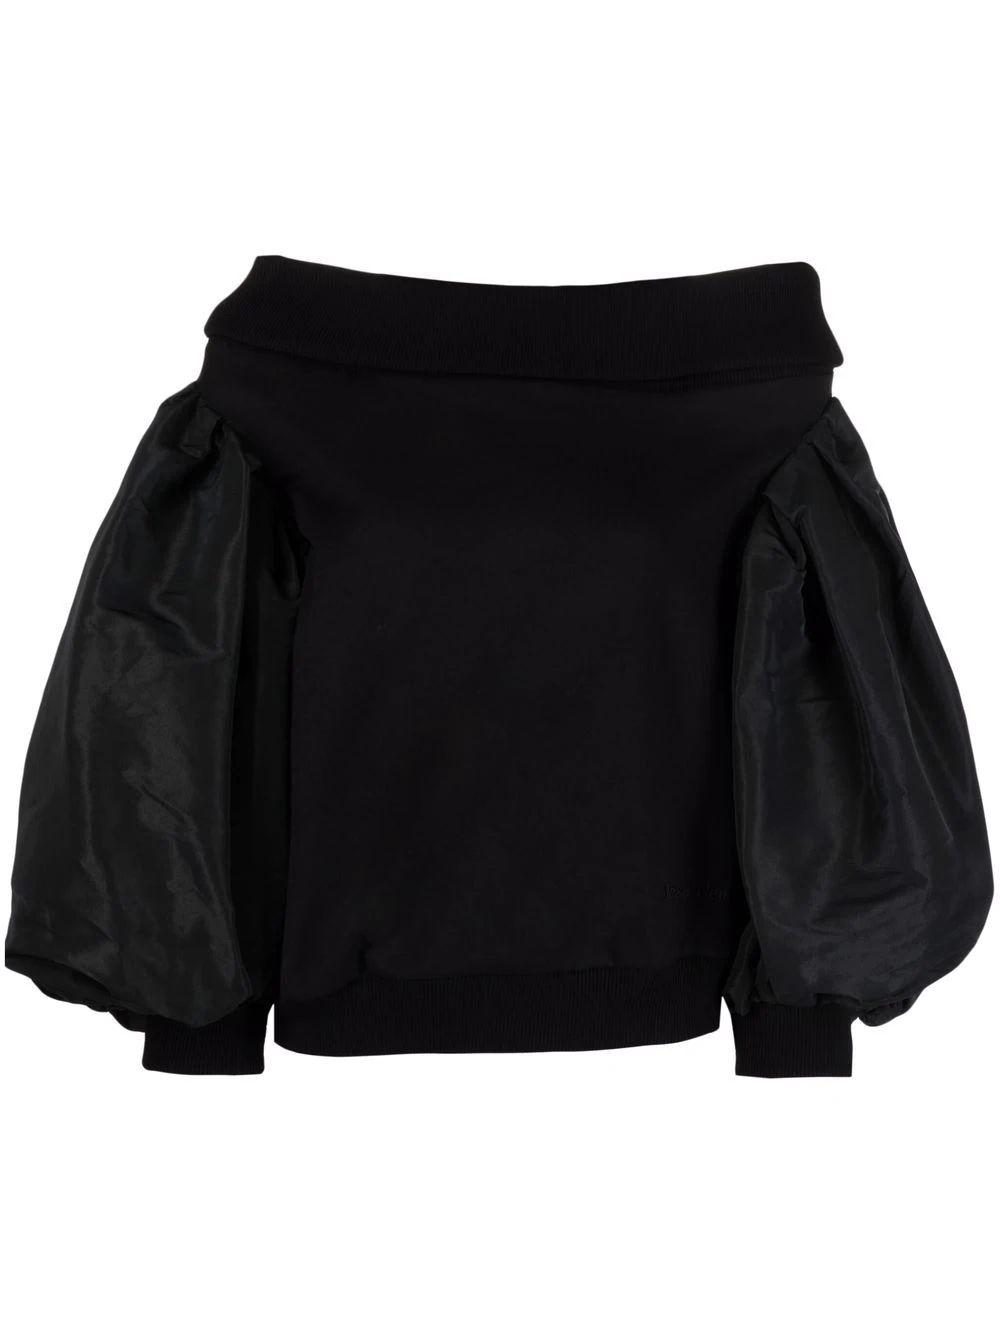 Off The Shoulder Puffy Sweatshirt Item # 672604QLABG